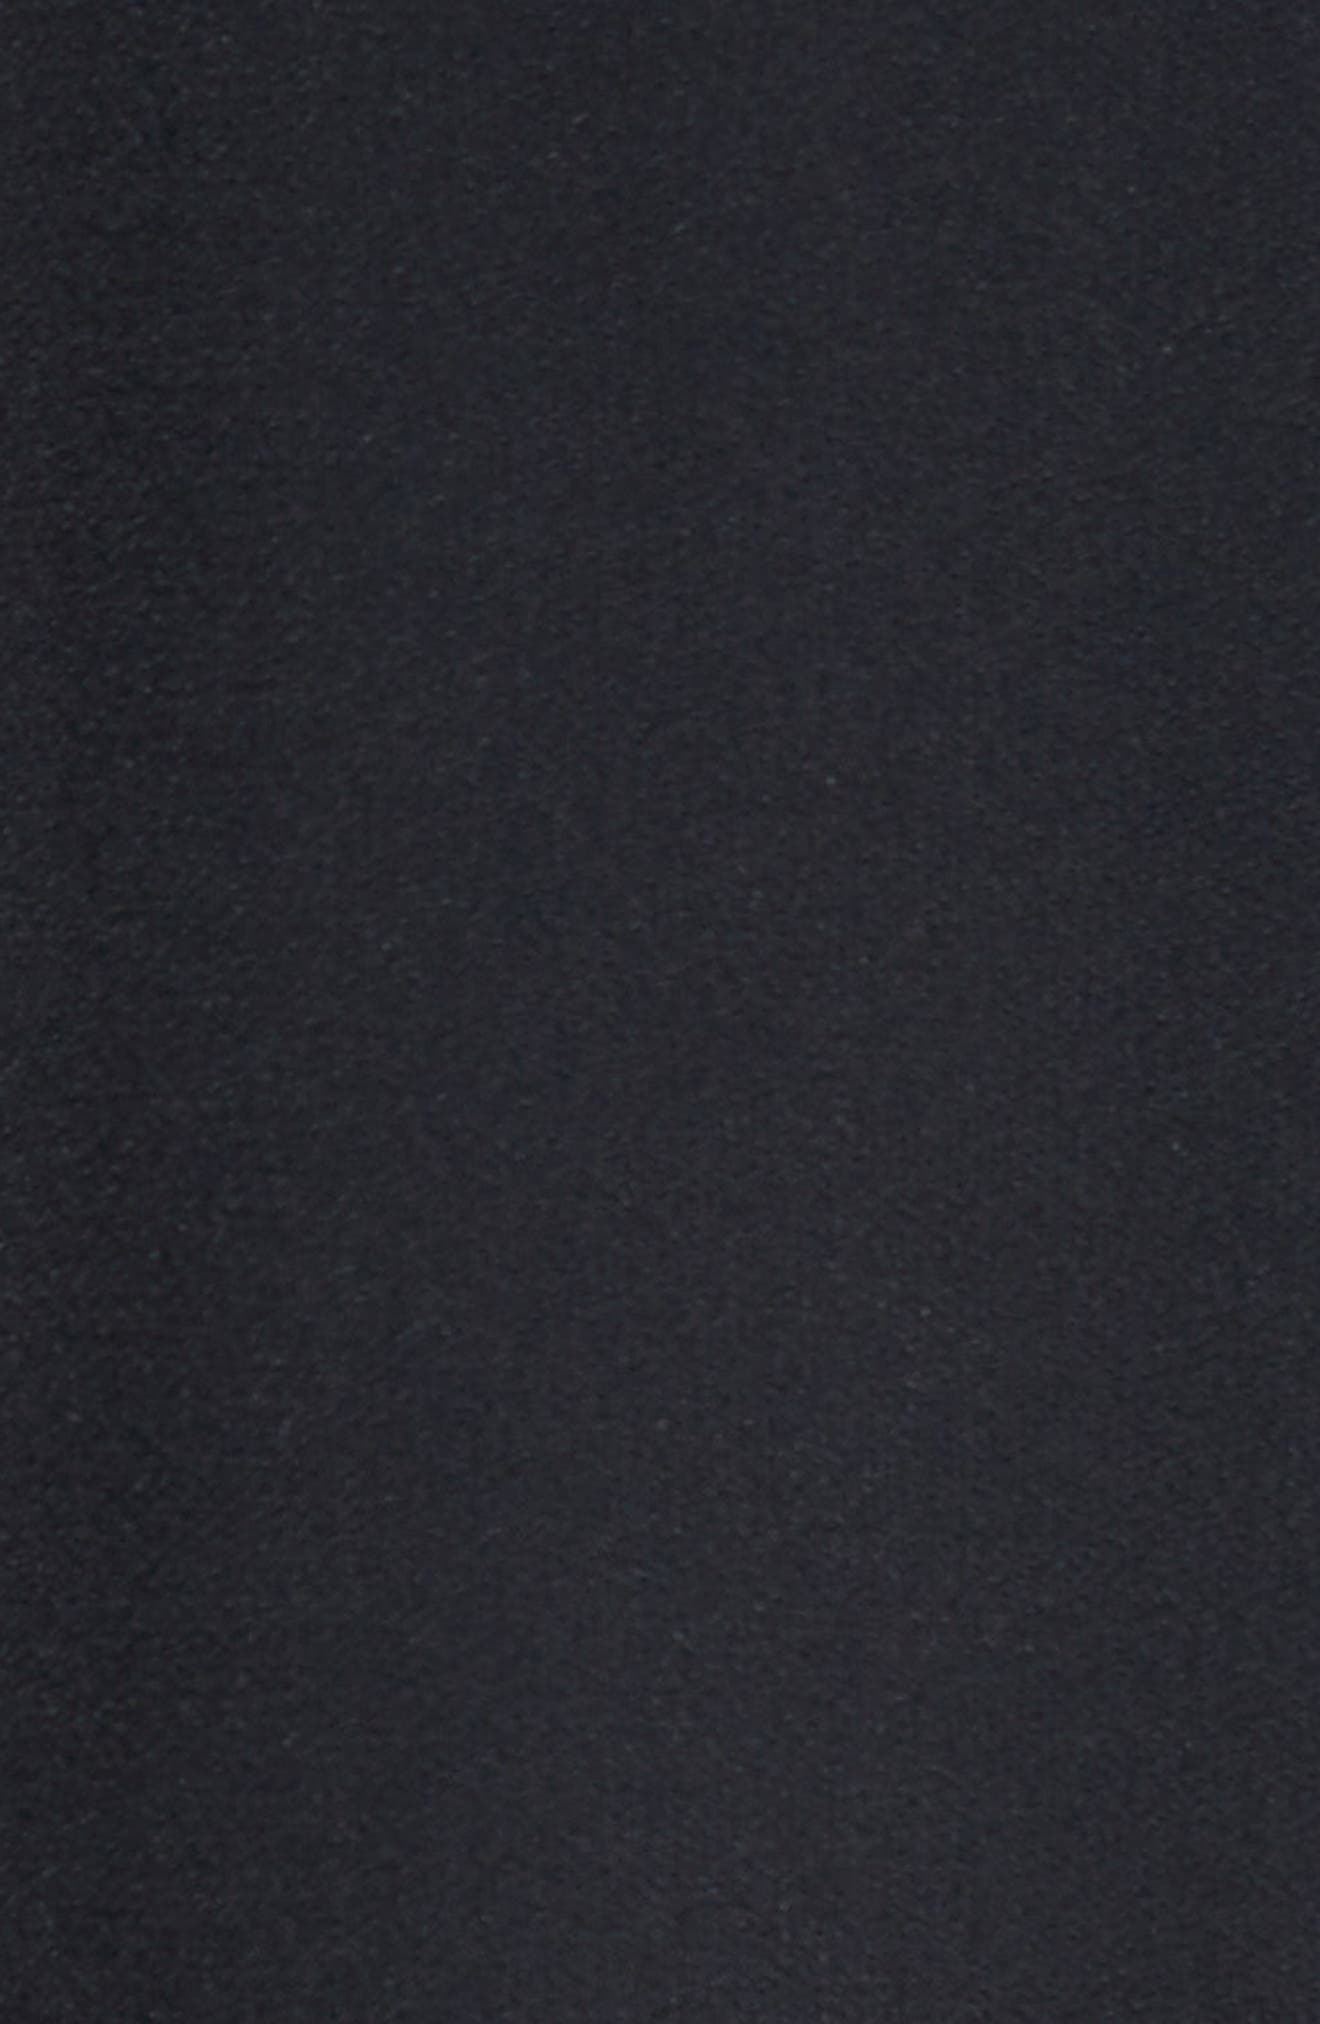 Ruffle Satin Backed Crepe Dress,                             Alternate thumbnail 4, color,                             Black